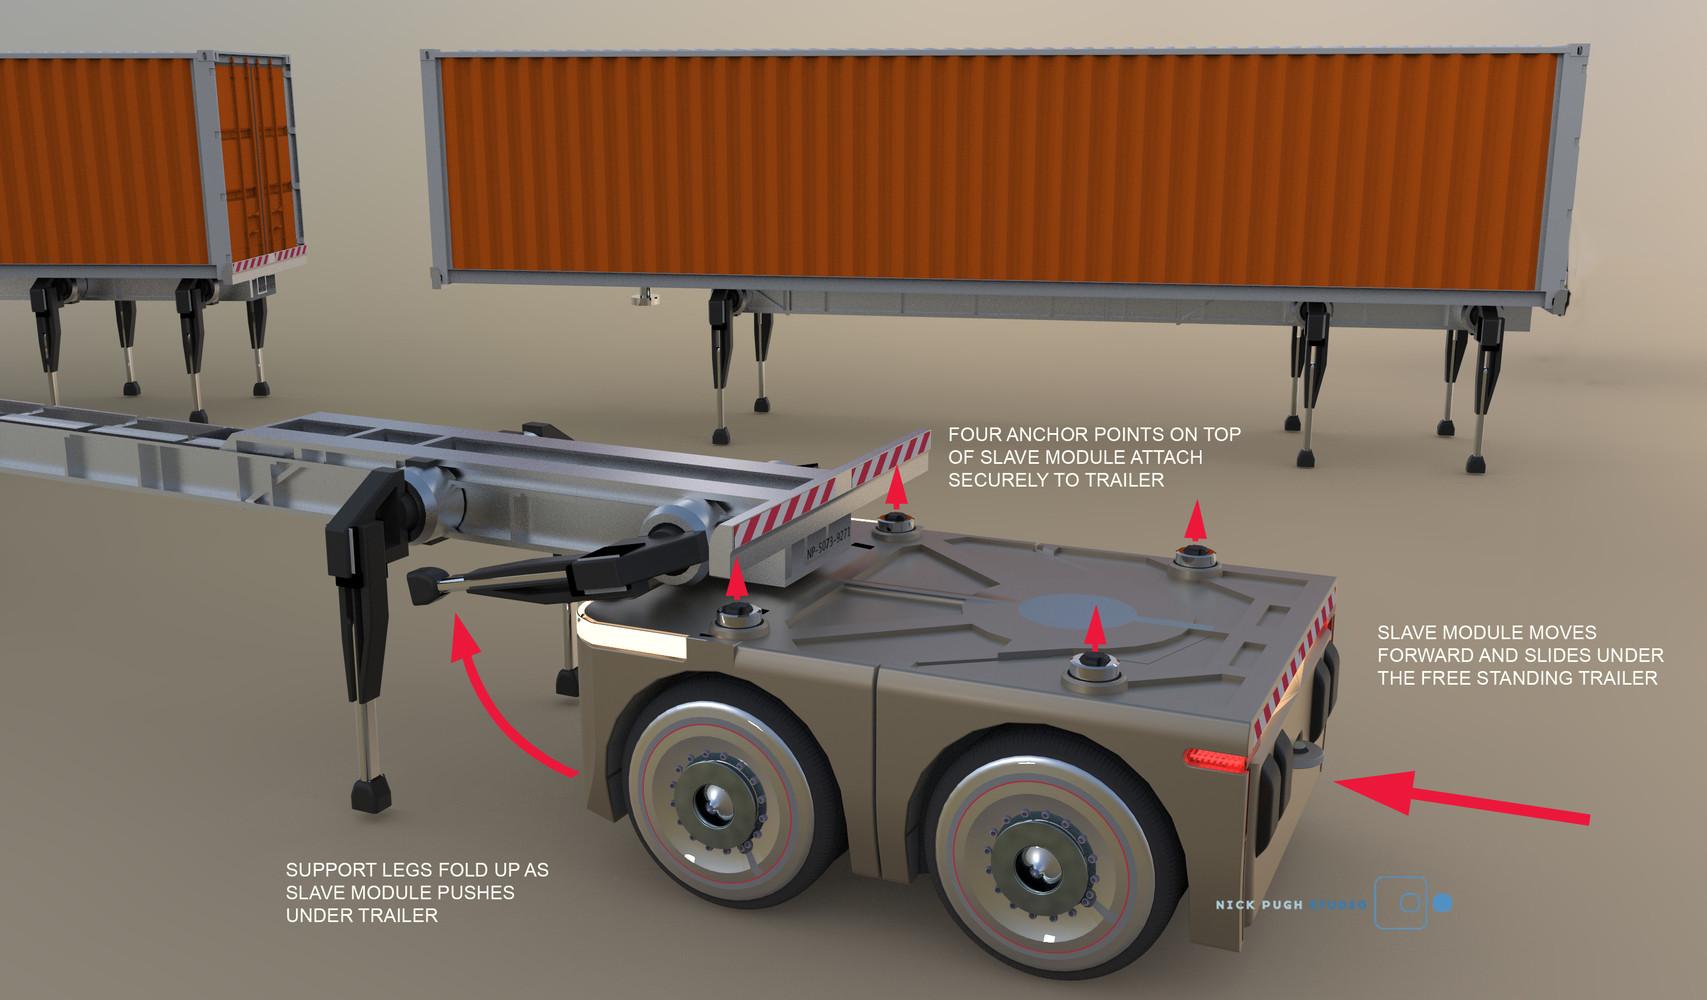 autoTruckTrailerLoading.jpg